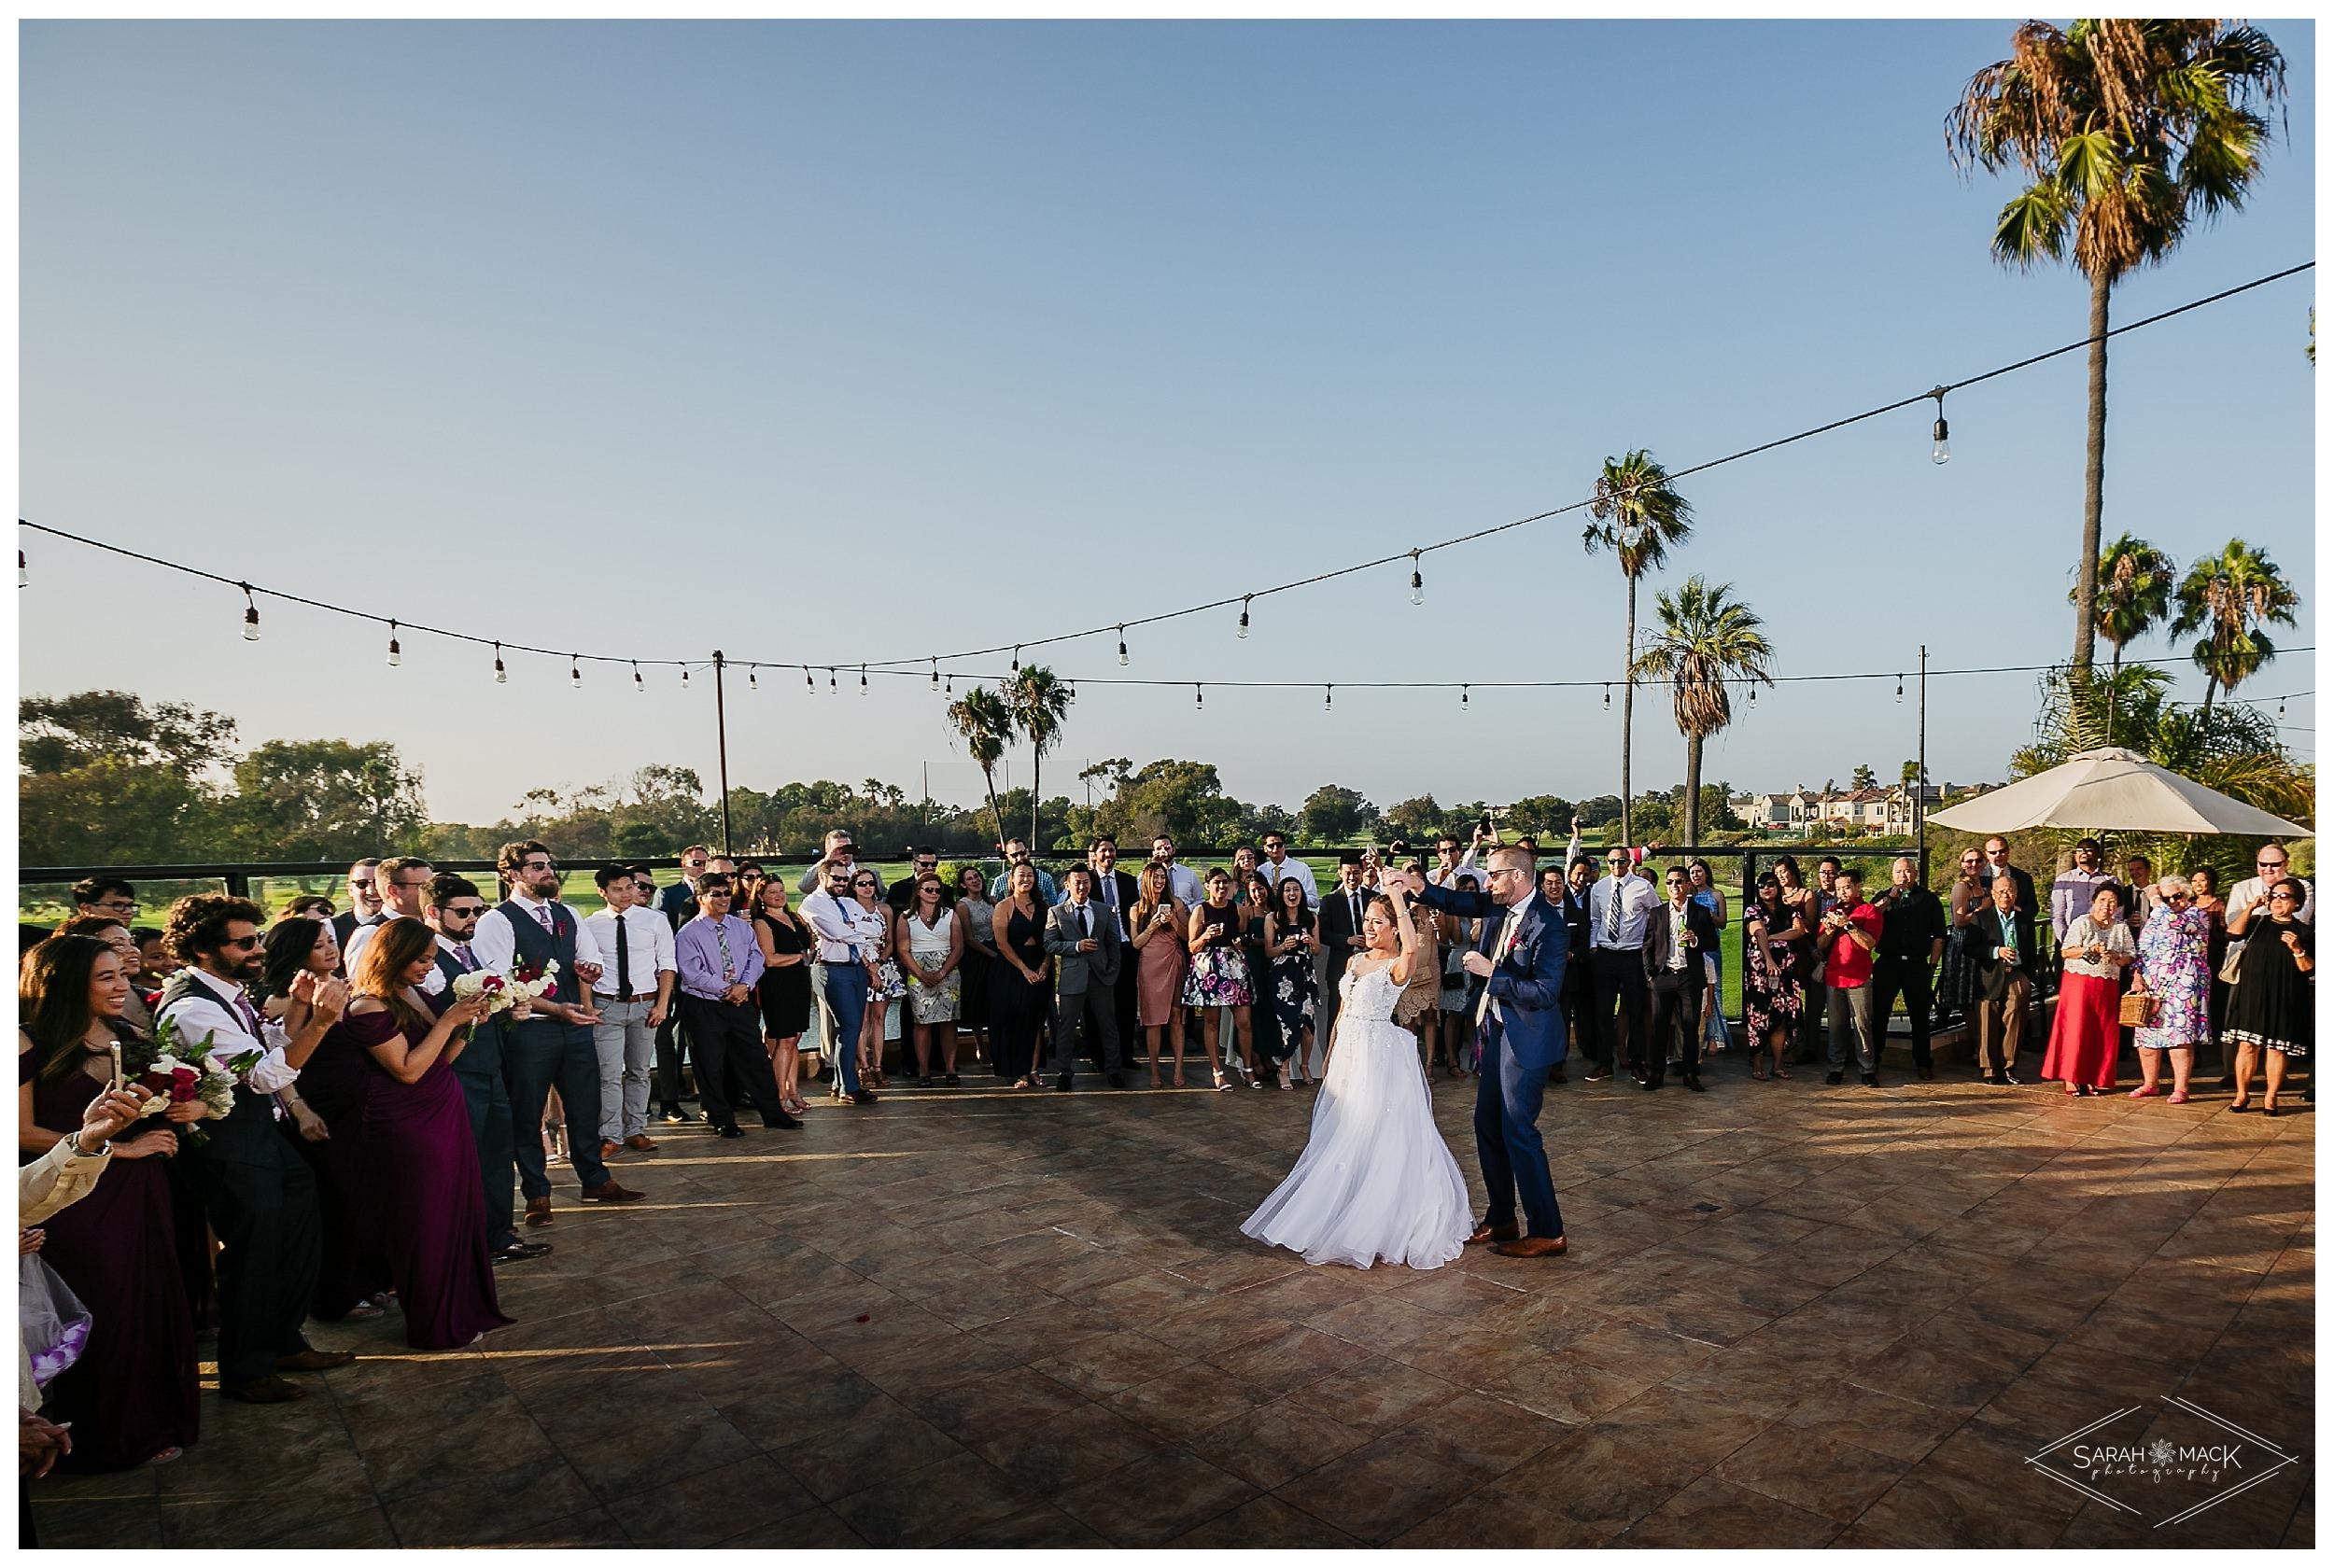 MR-Sea-Cliffe-Country-Club-Huntington-Beach-Wedding-0131.jpg